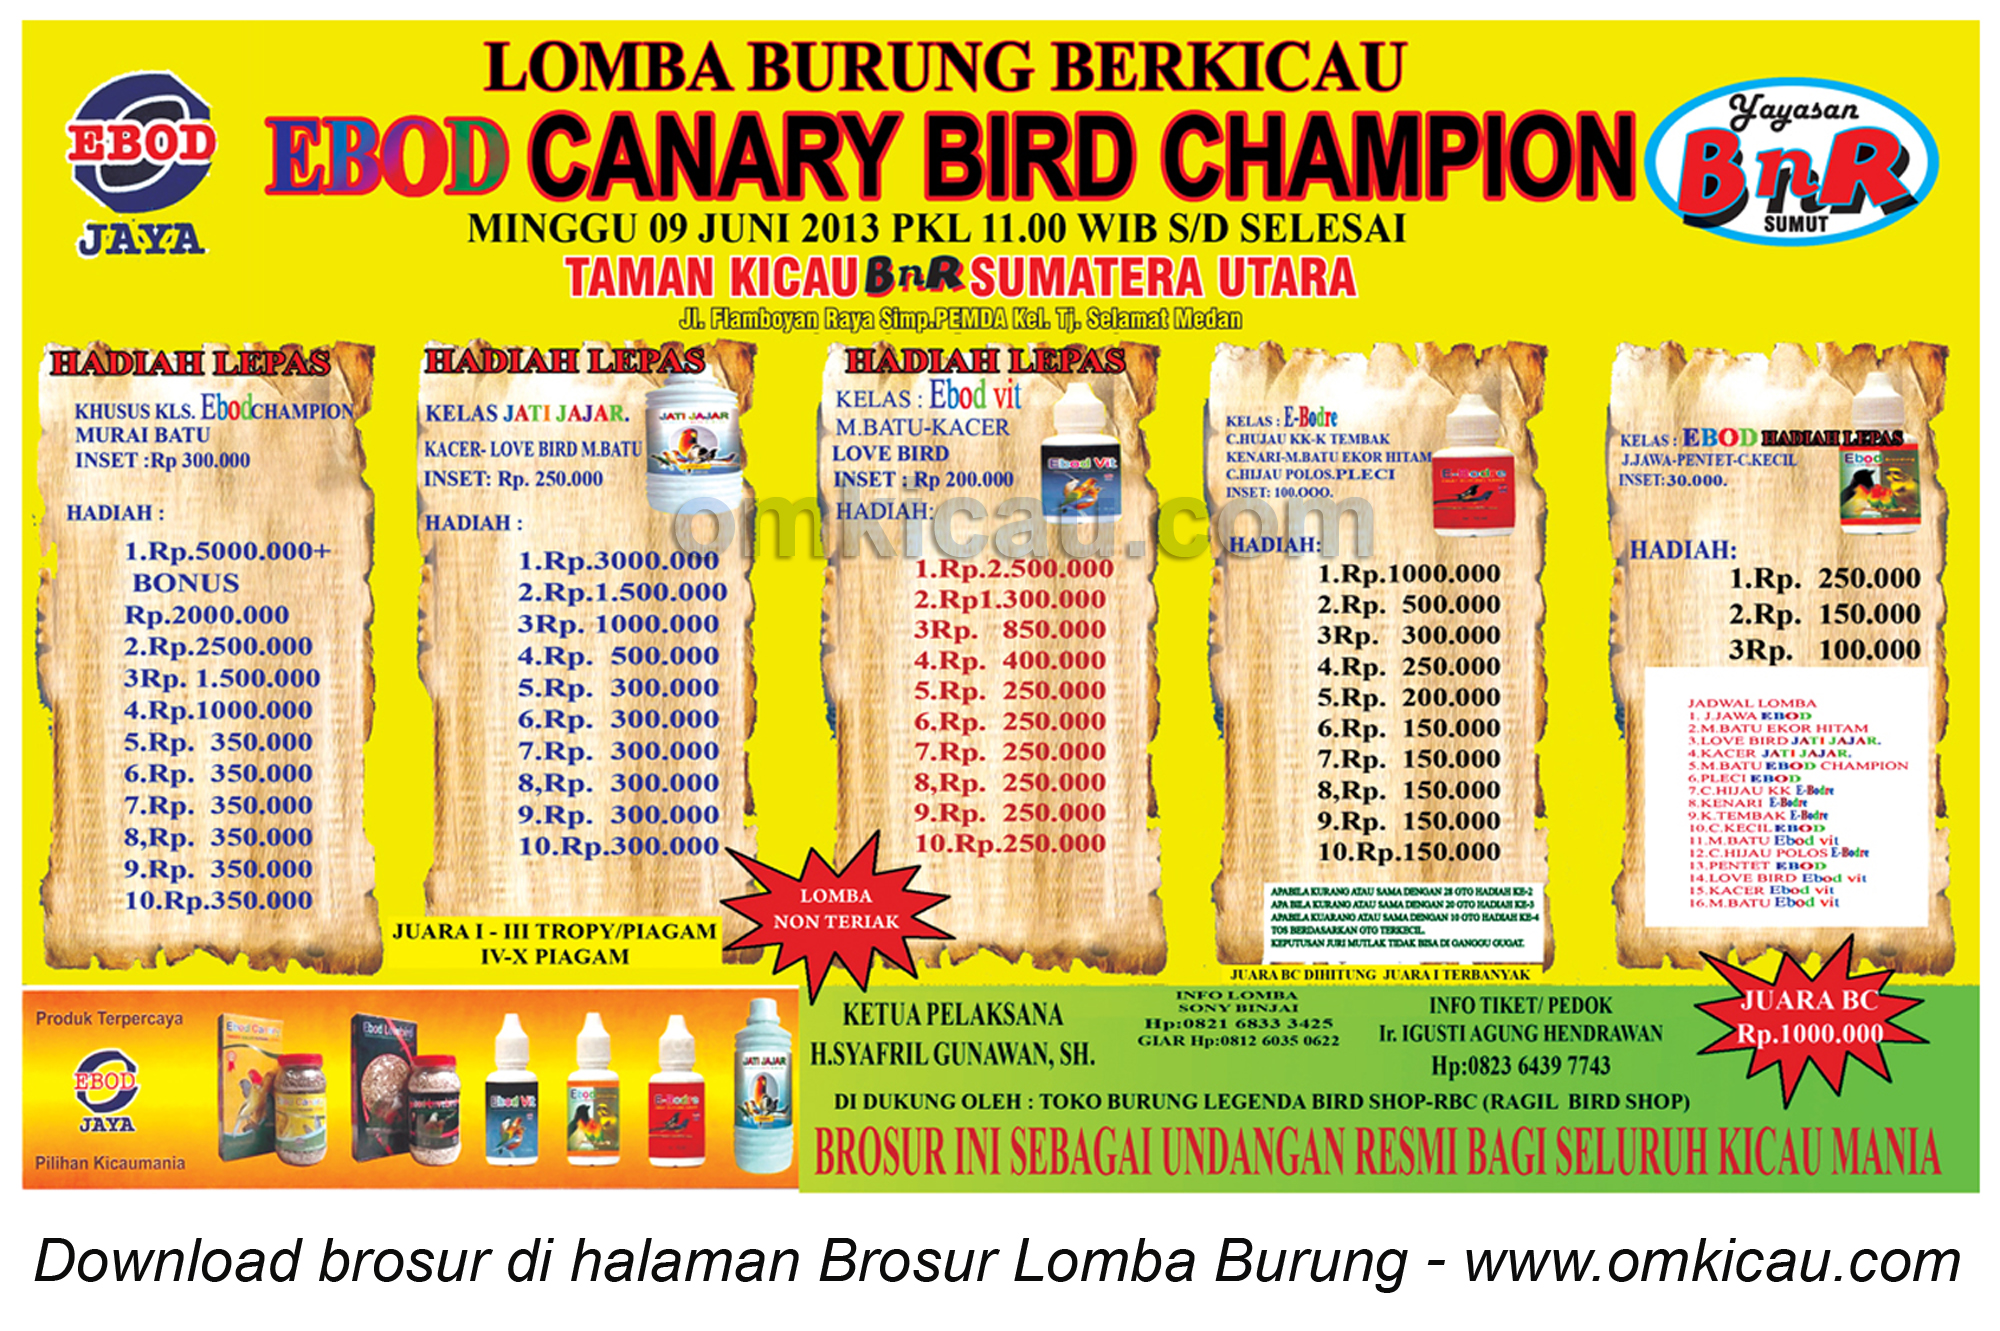 BROSUR LOMBA EBOD CANARY BIRD CHAMPION MEDAN 9 JUNI 2013